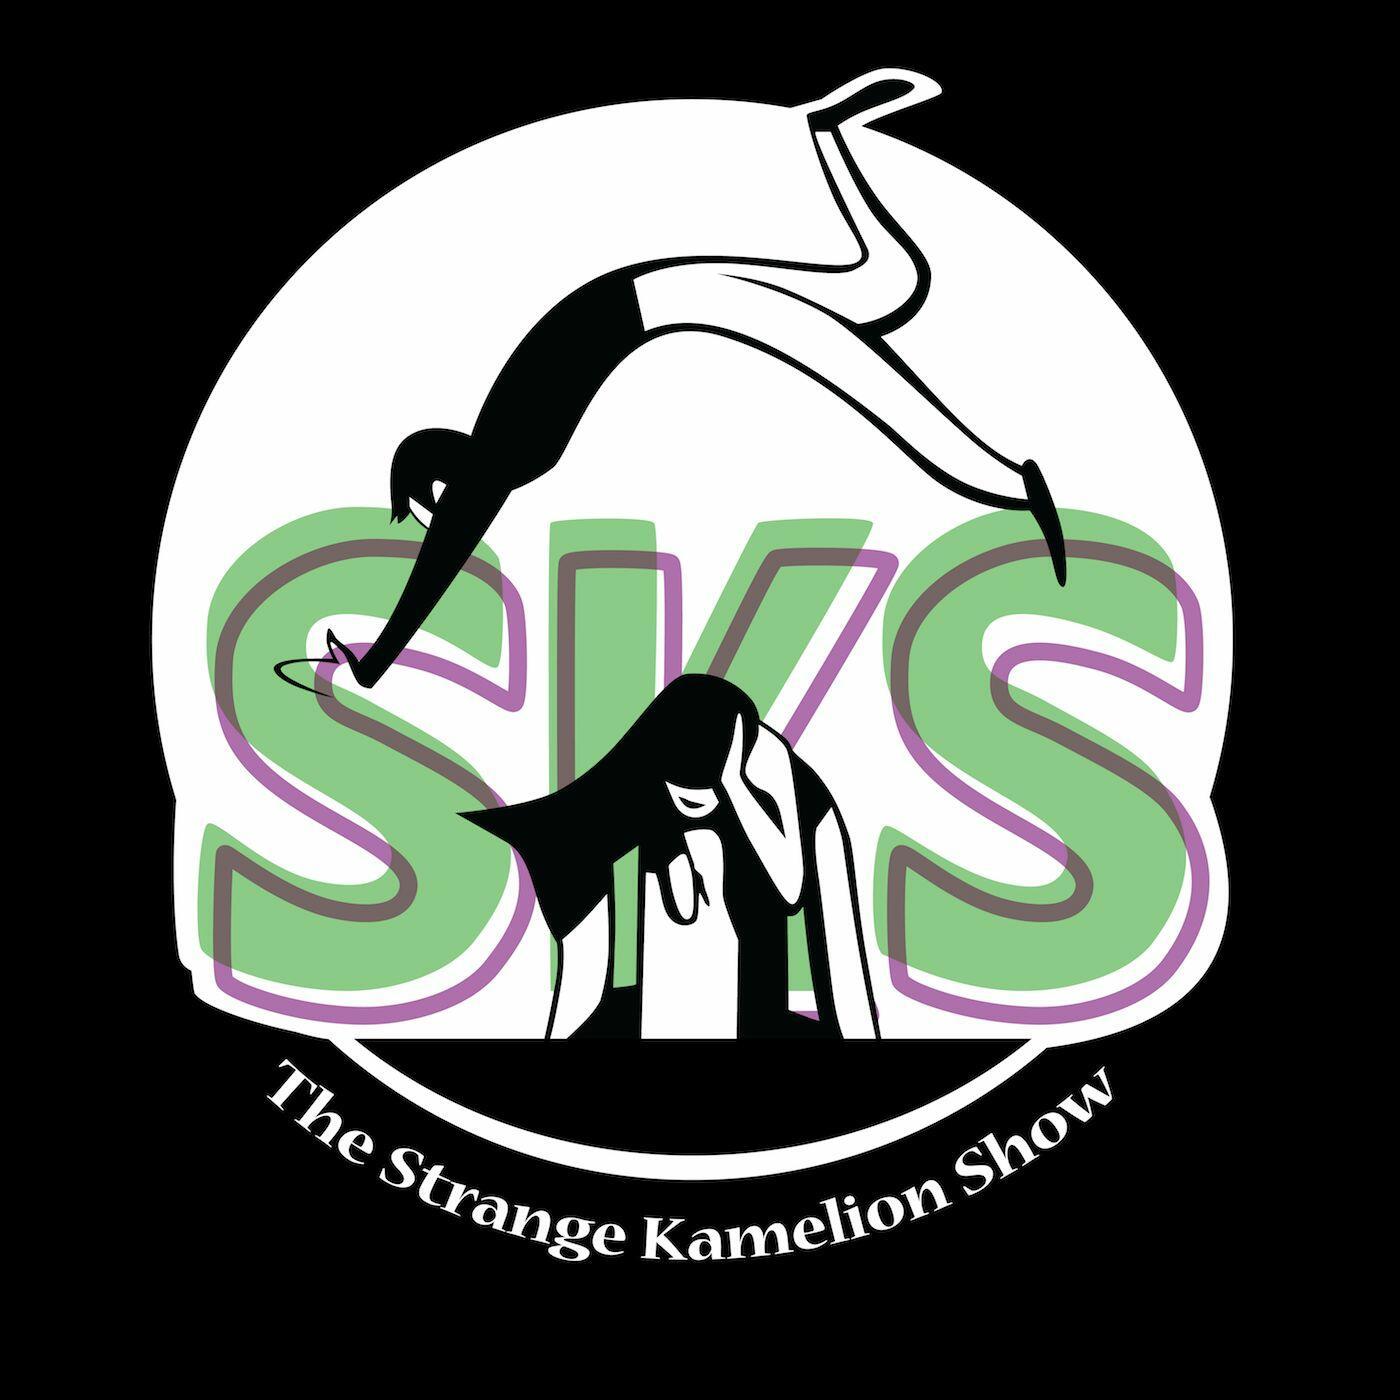 The Strange Kamelion Show